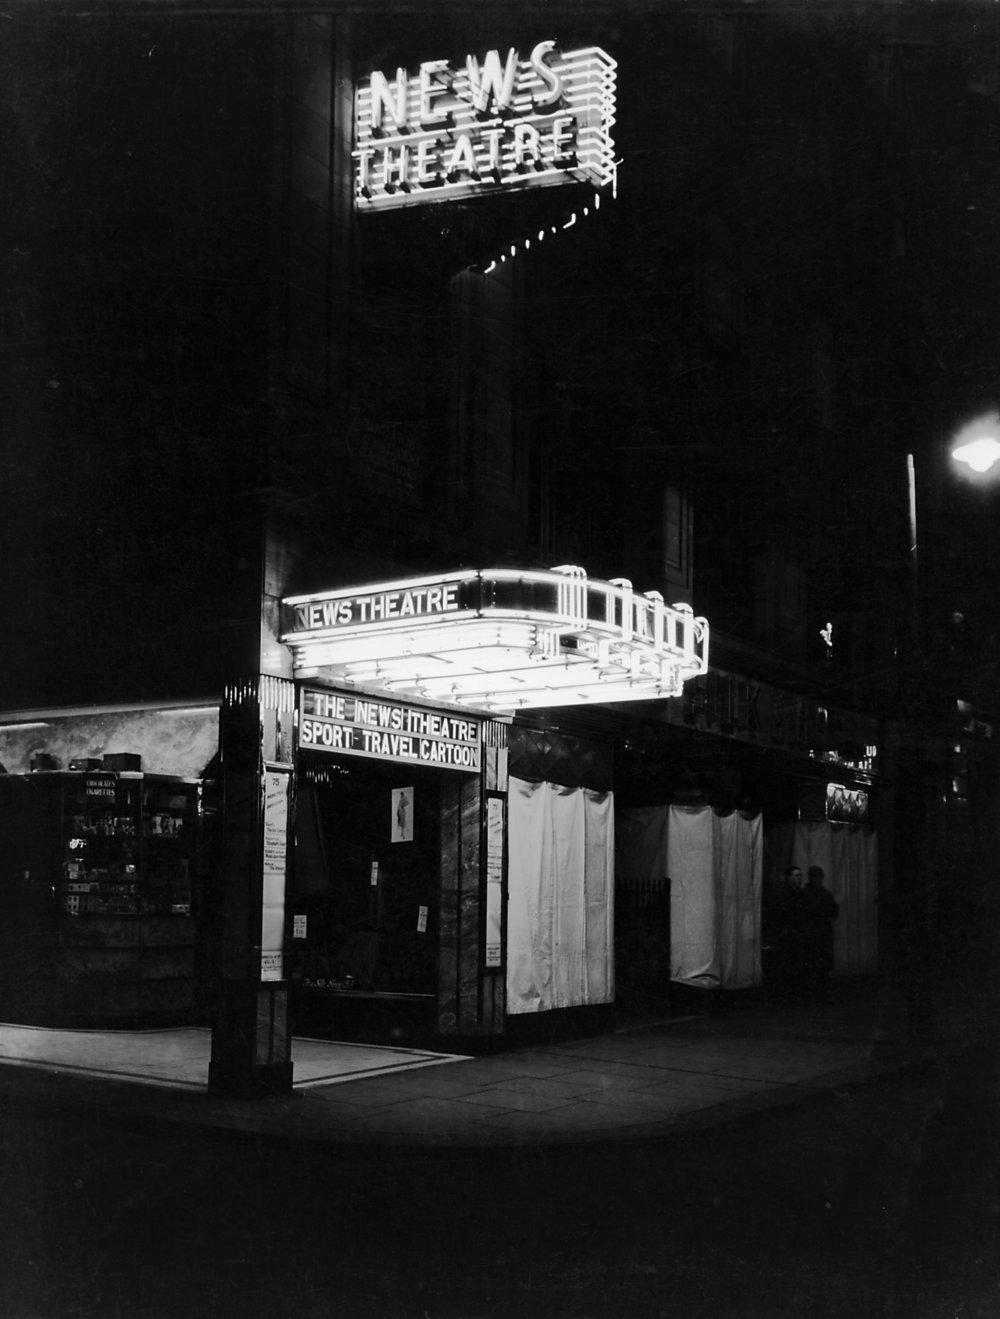 News Theatre (now Tyneside Cinema), Newcastle, 1938